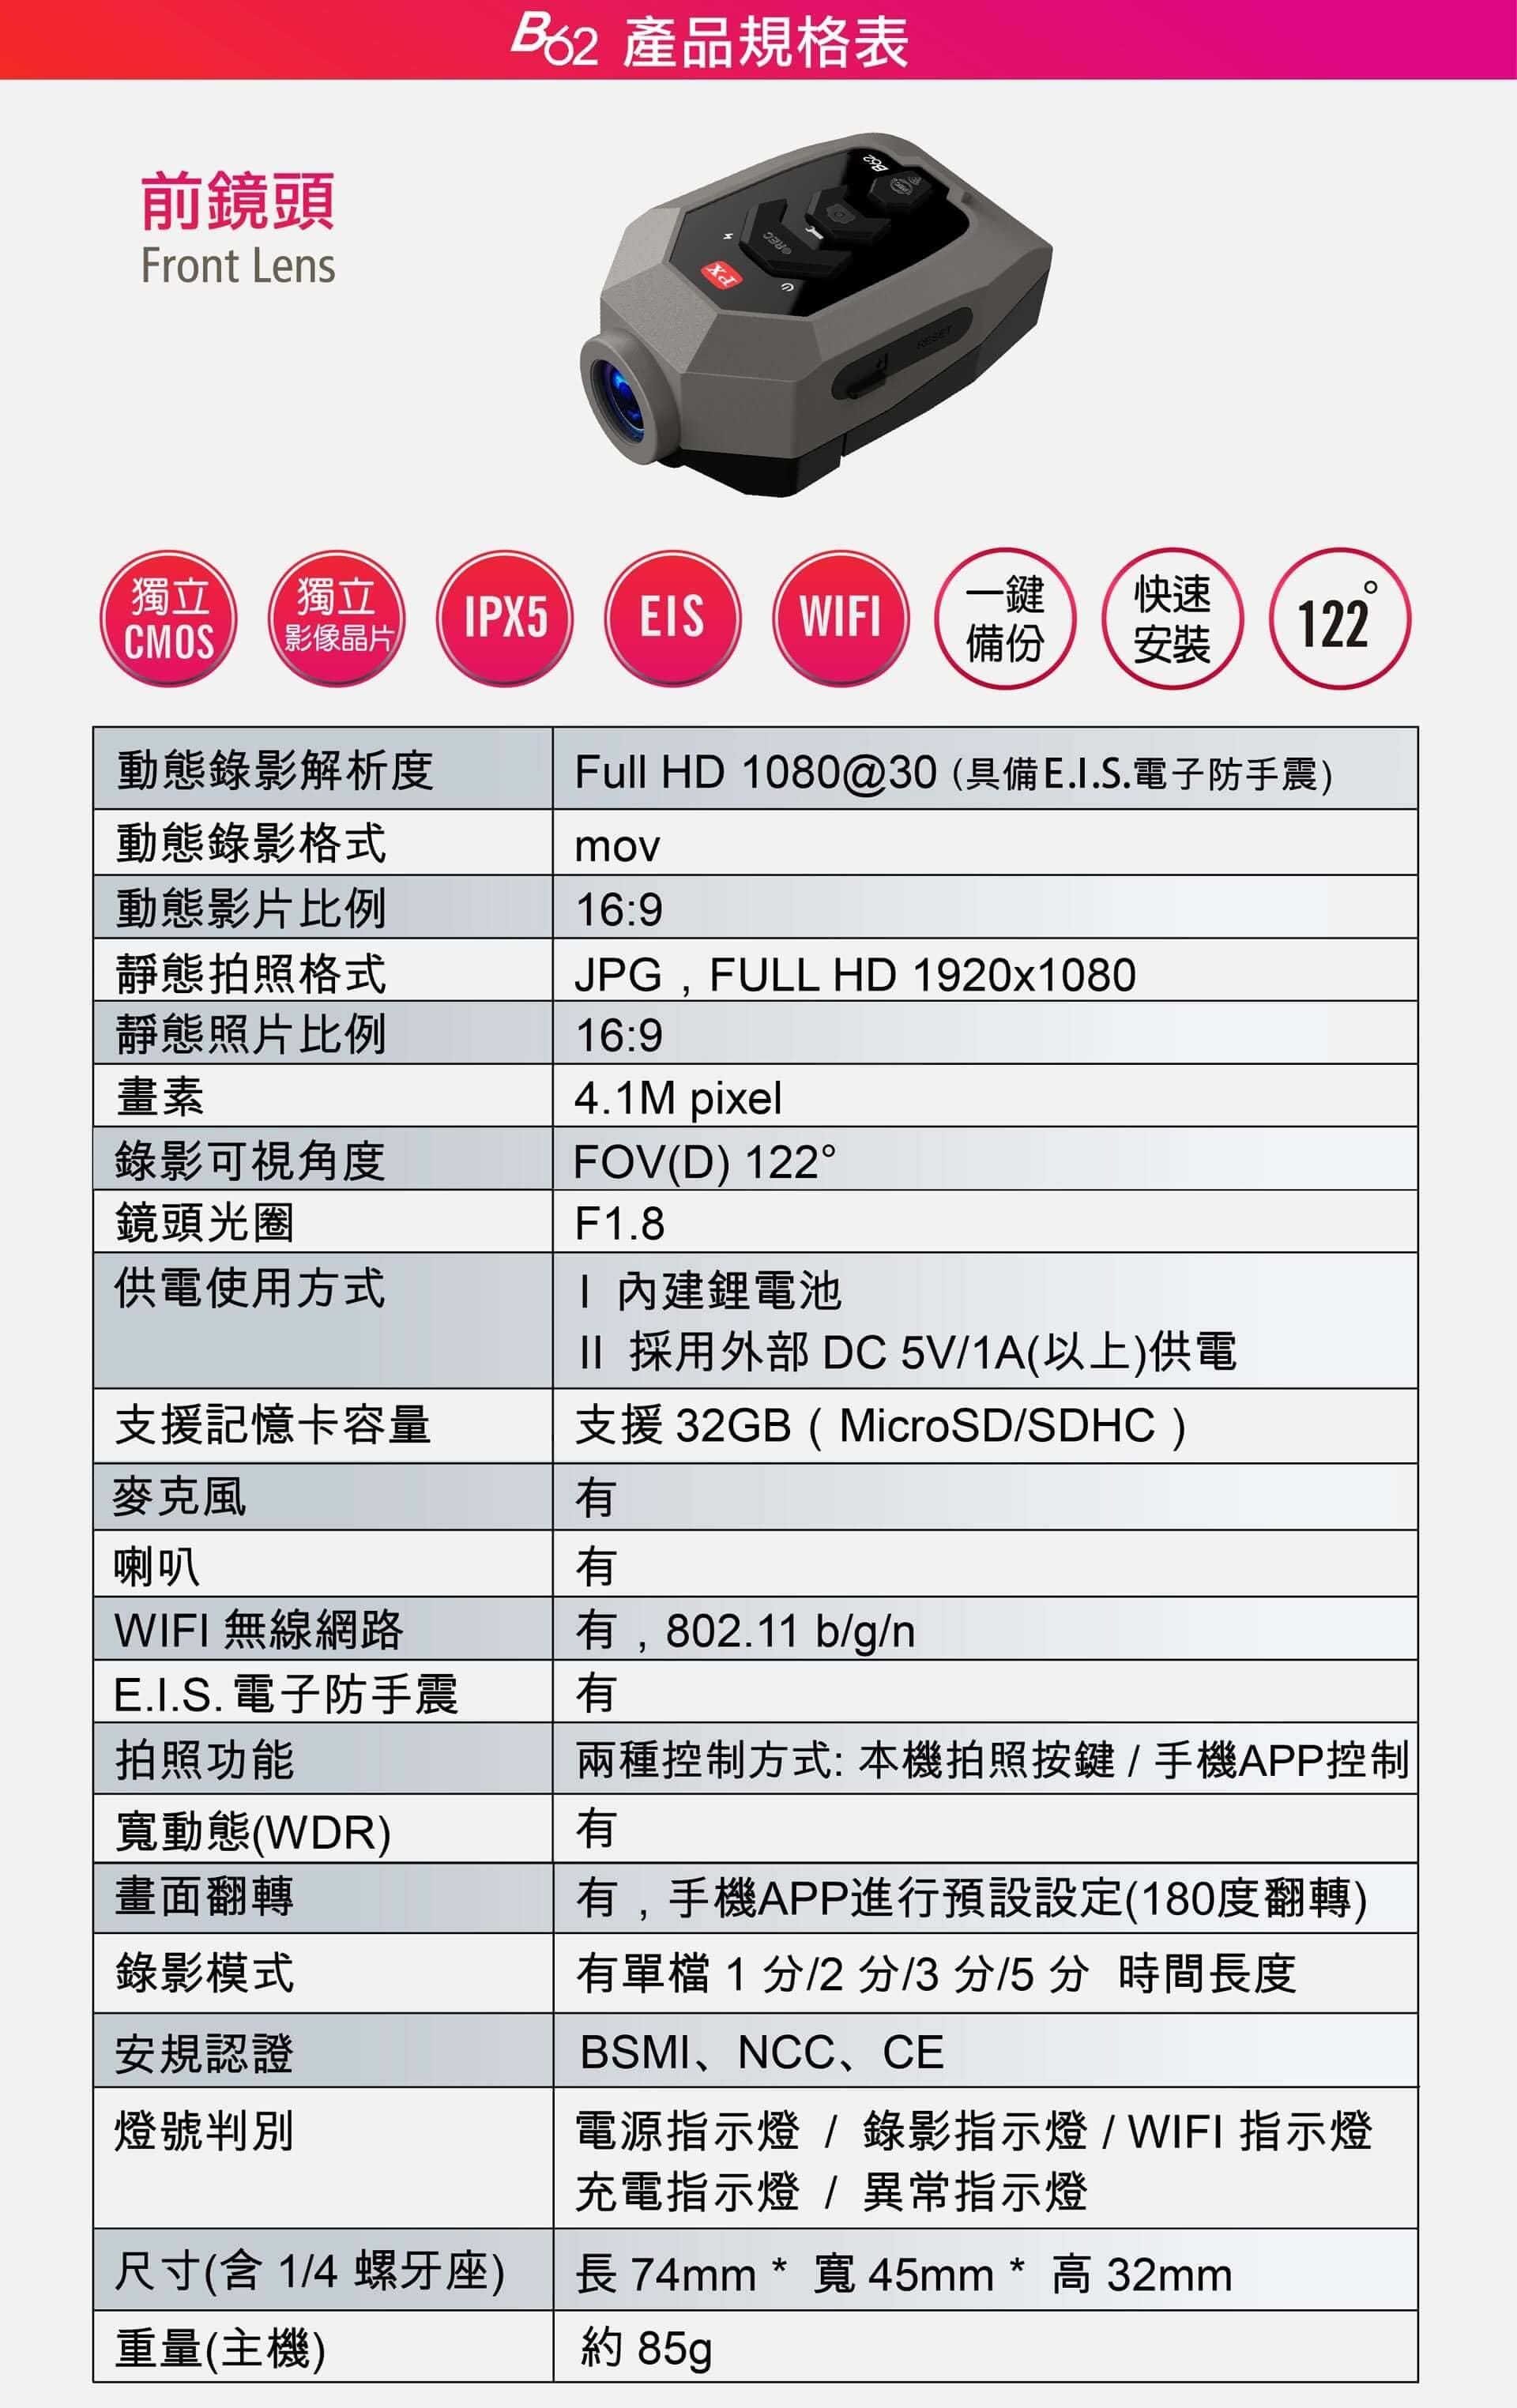 proimages/product/pro-01/pro-01-002/B62/B62-15-1.jpg